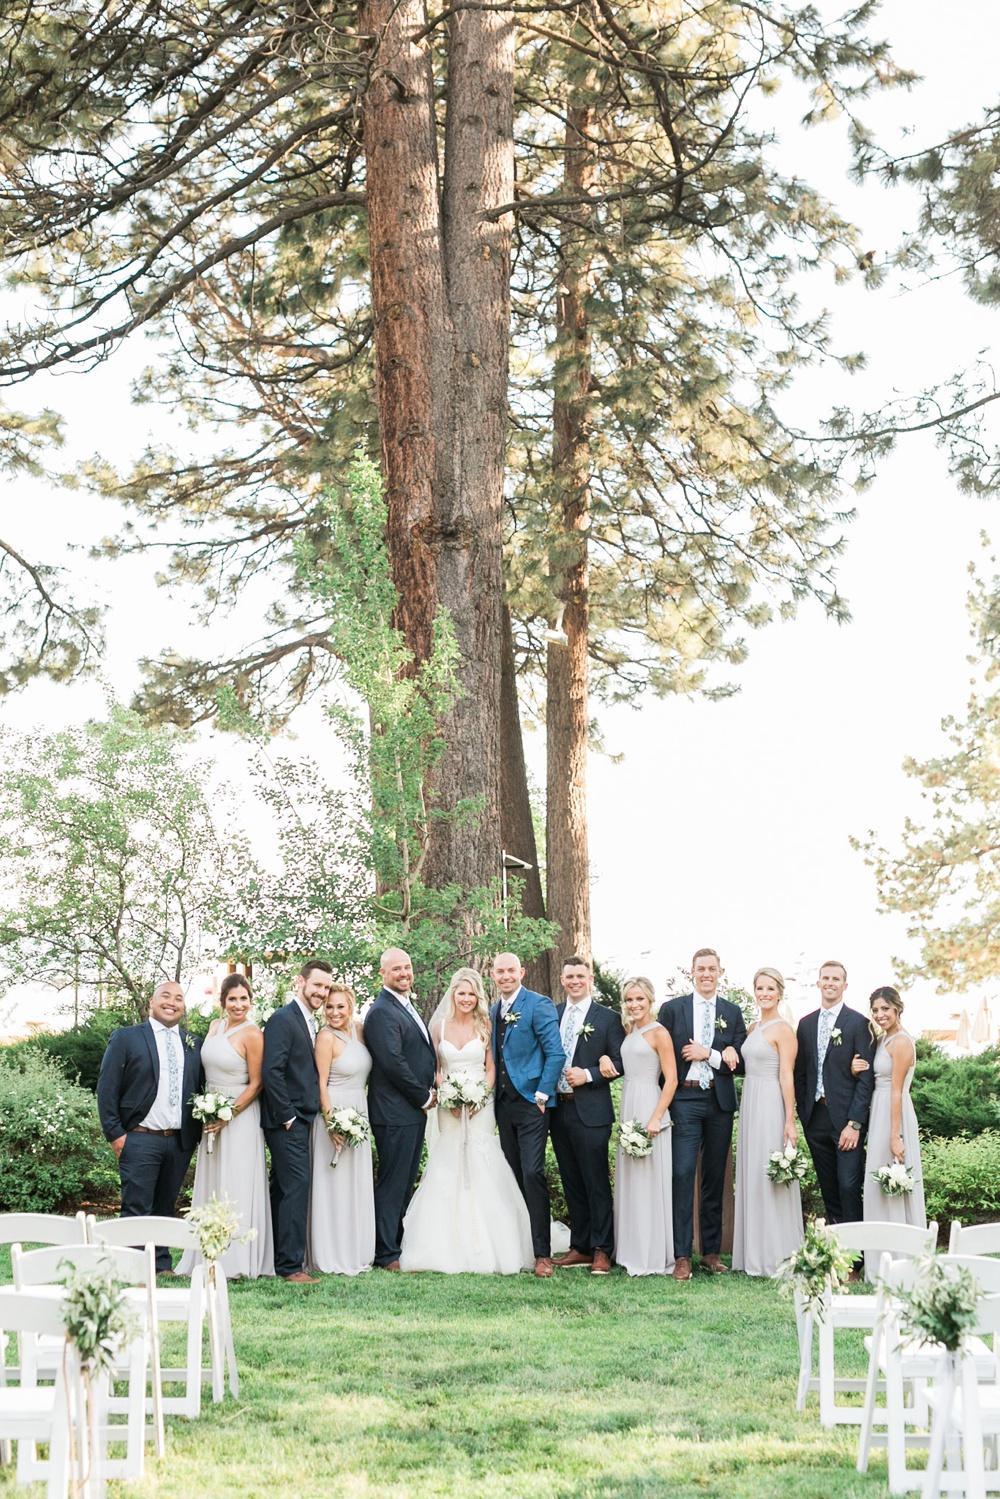 Hyatt-Lake-Tahoe-Wedding-Photographer-Regency-Mandy-Ford-Photography_0046.jpg